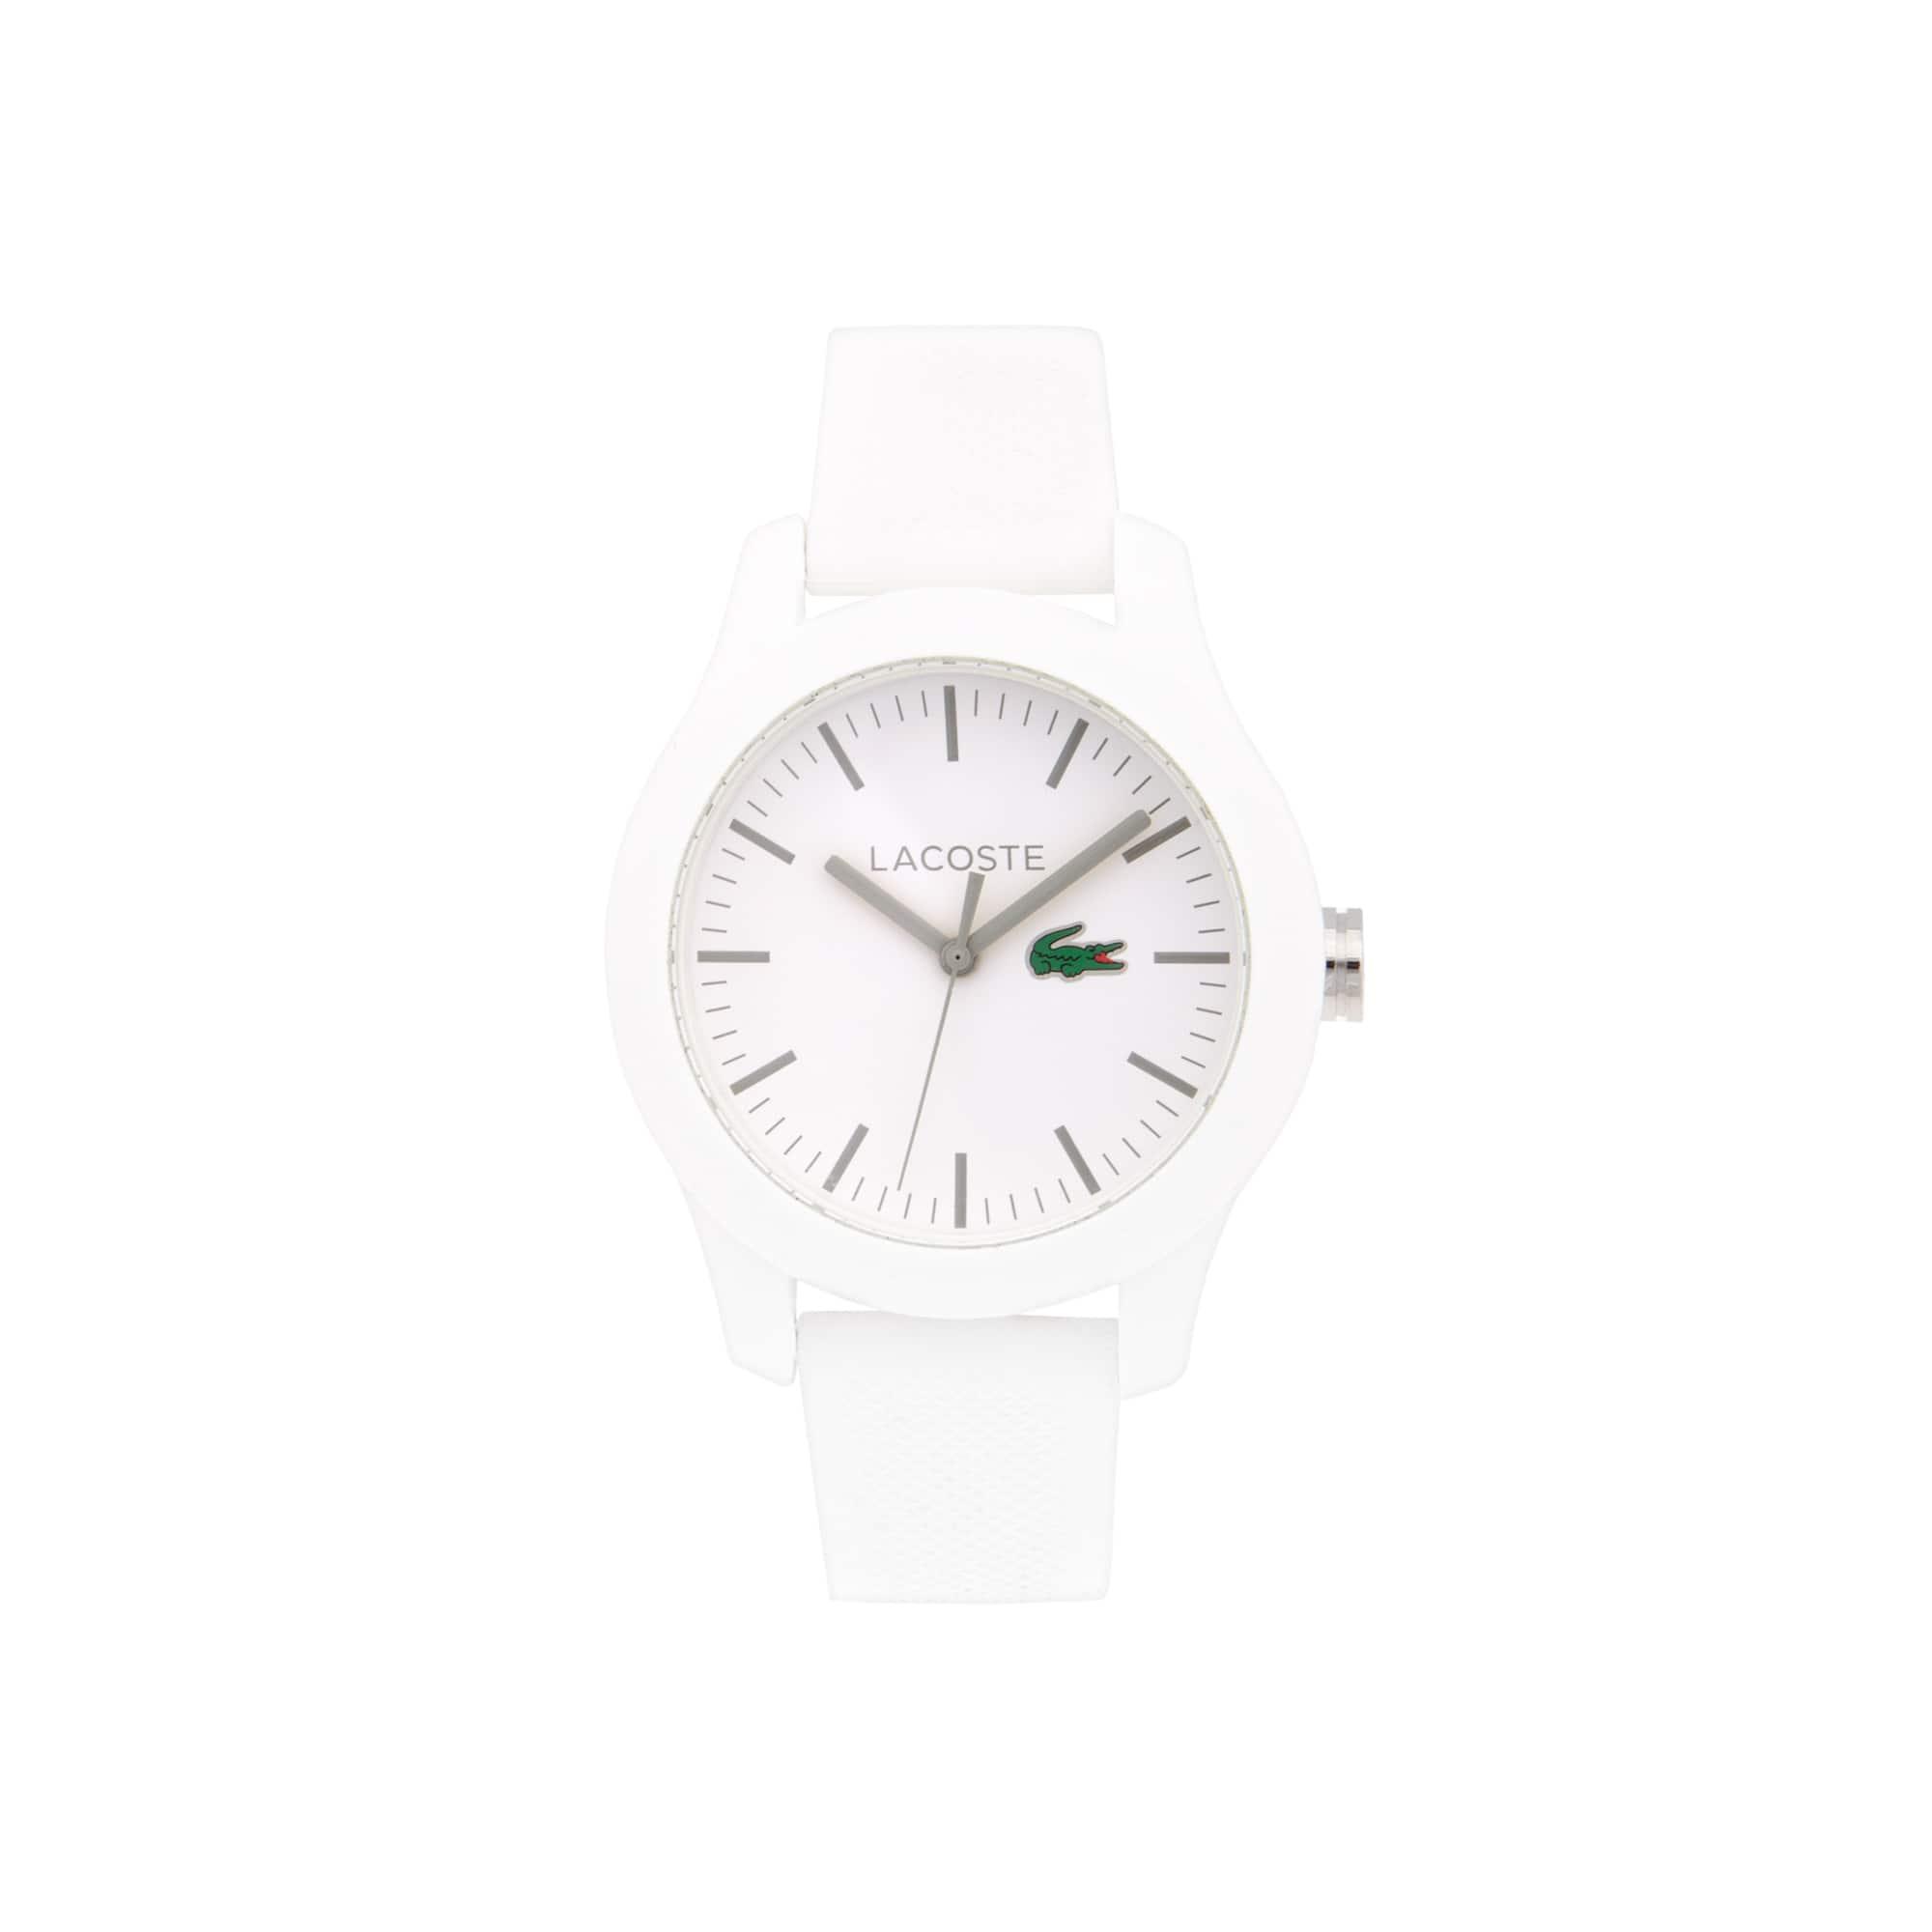 Men's Lacoste 12.12 Watch - White Edition